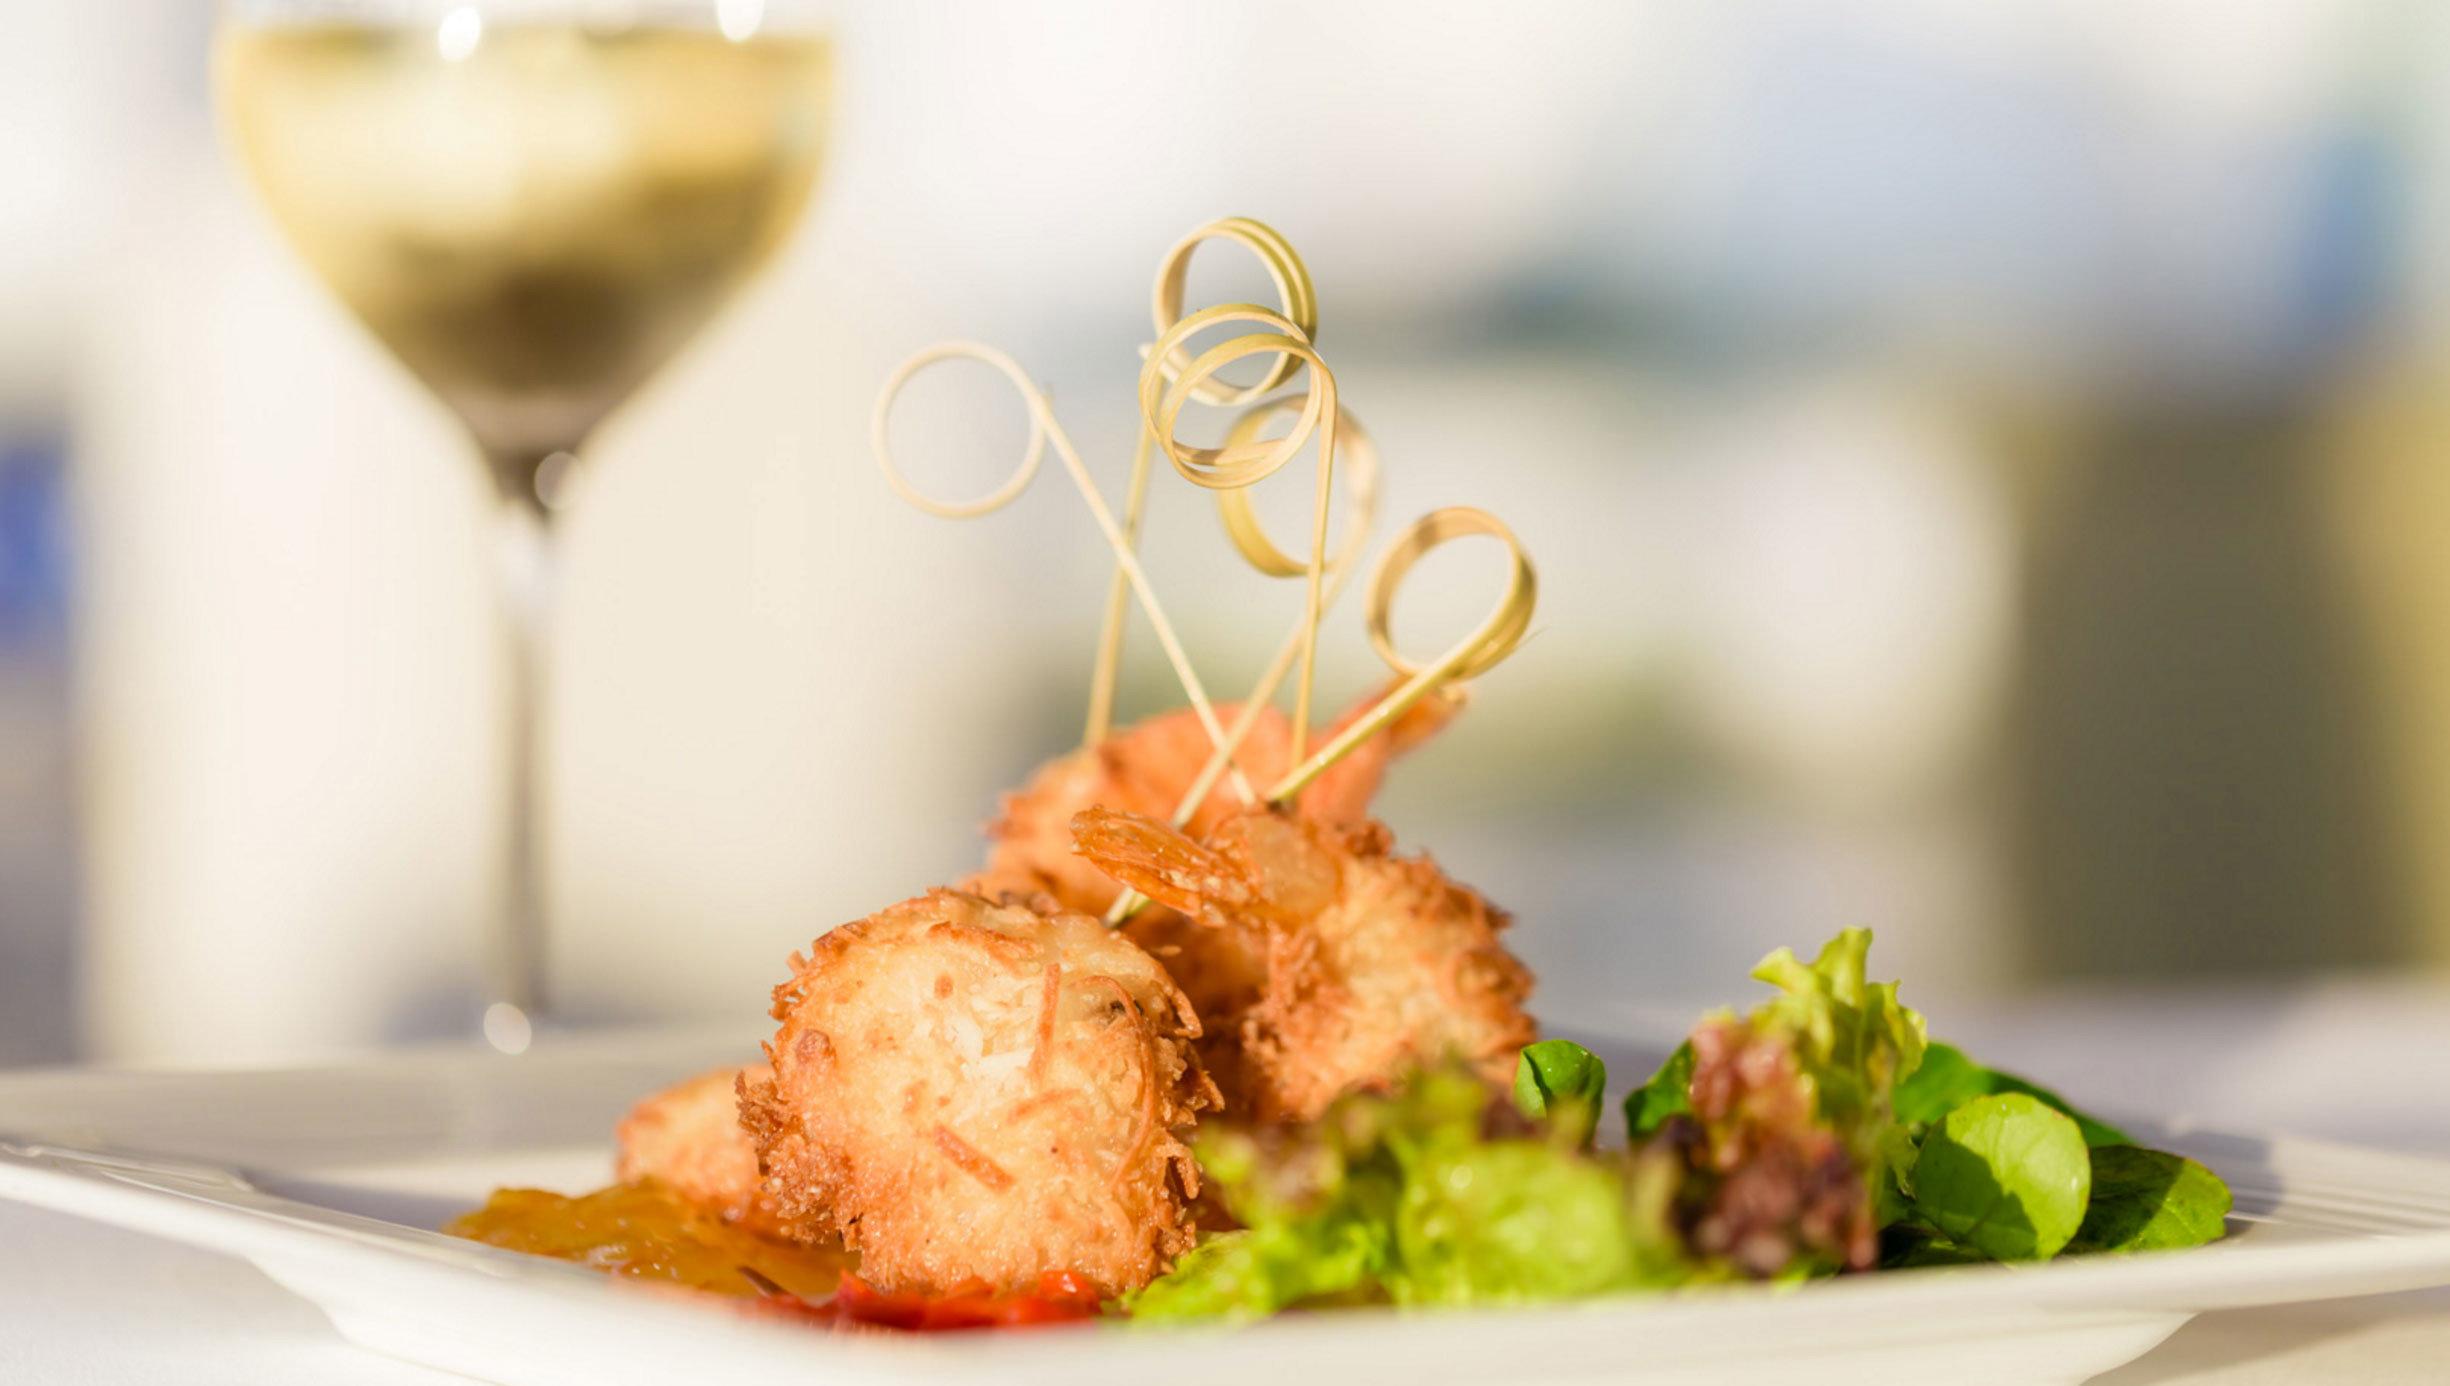 food plate fish restaurant cuisine fried food sense Seafood meat half eaten close